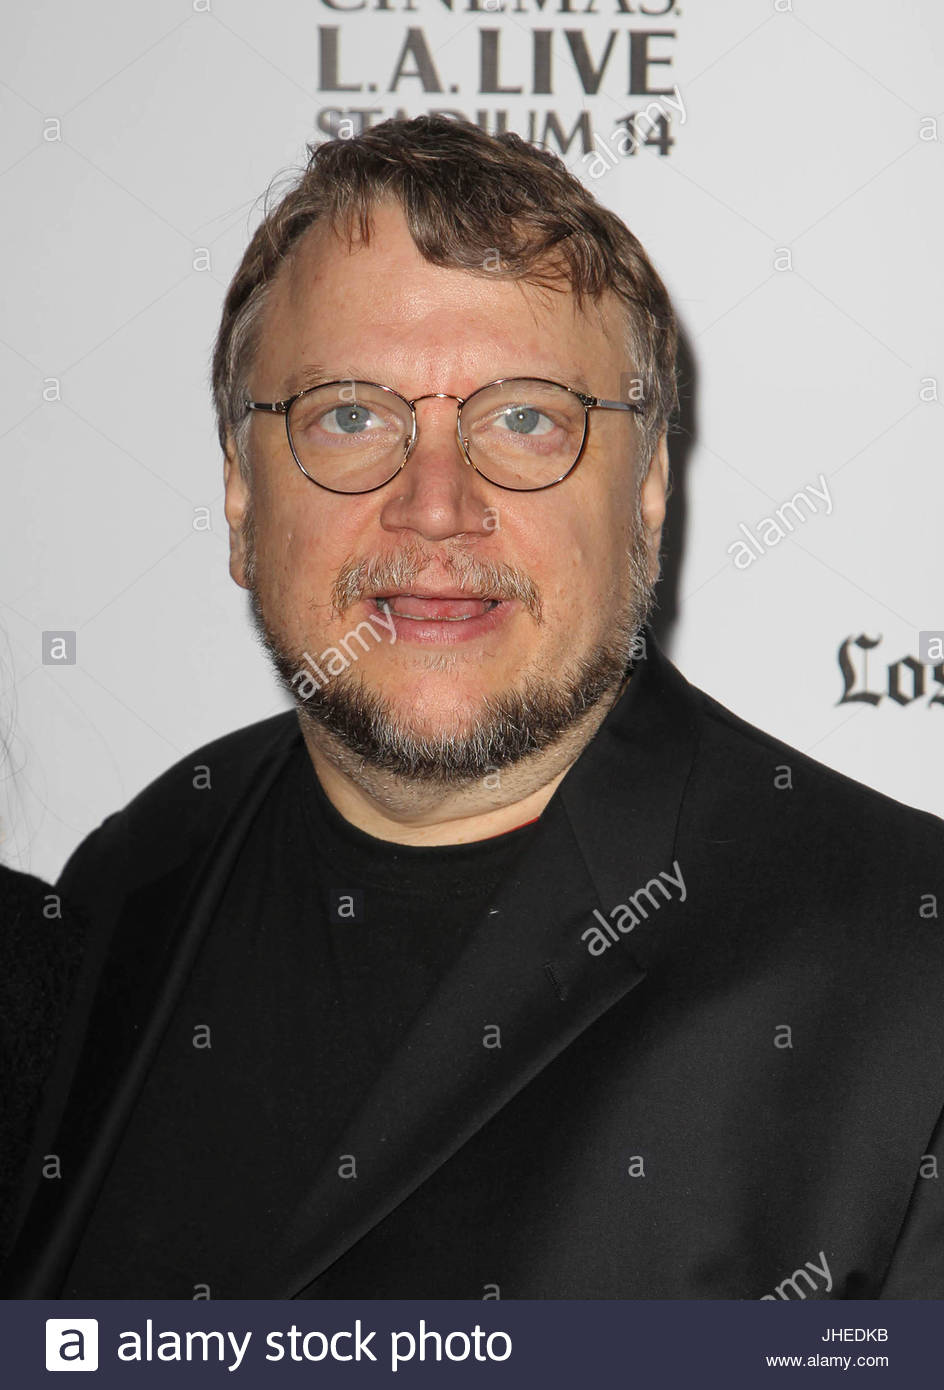 Guilhermo Del Toro for guillermo del toro, lorenza newton. 'i'm so excited' opening night